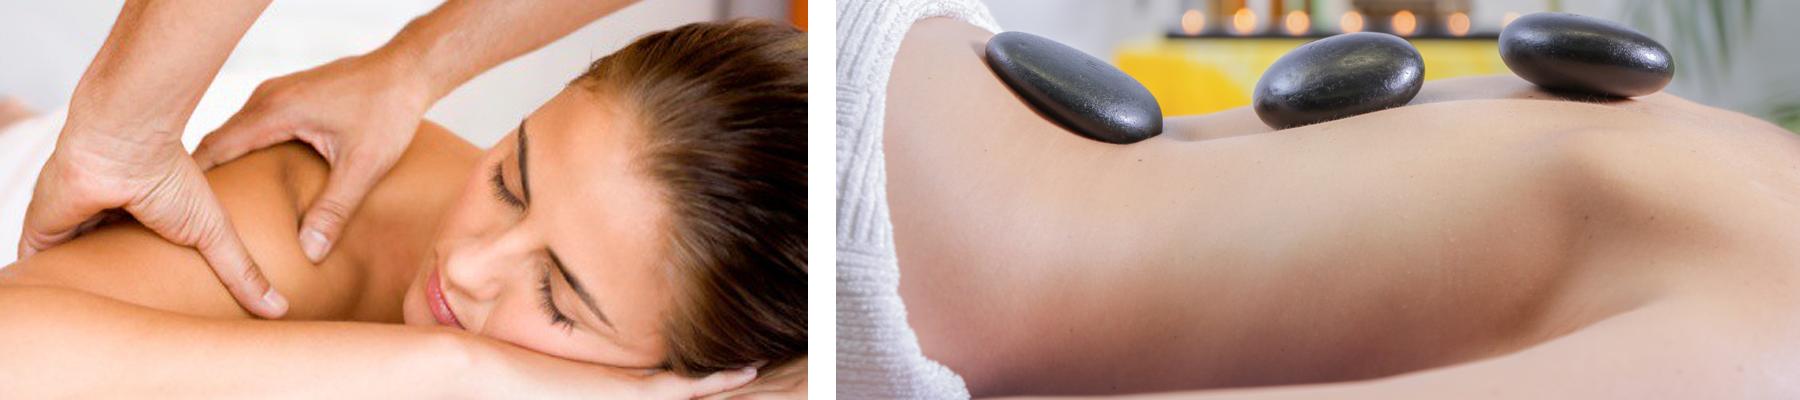 massagim cover